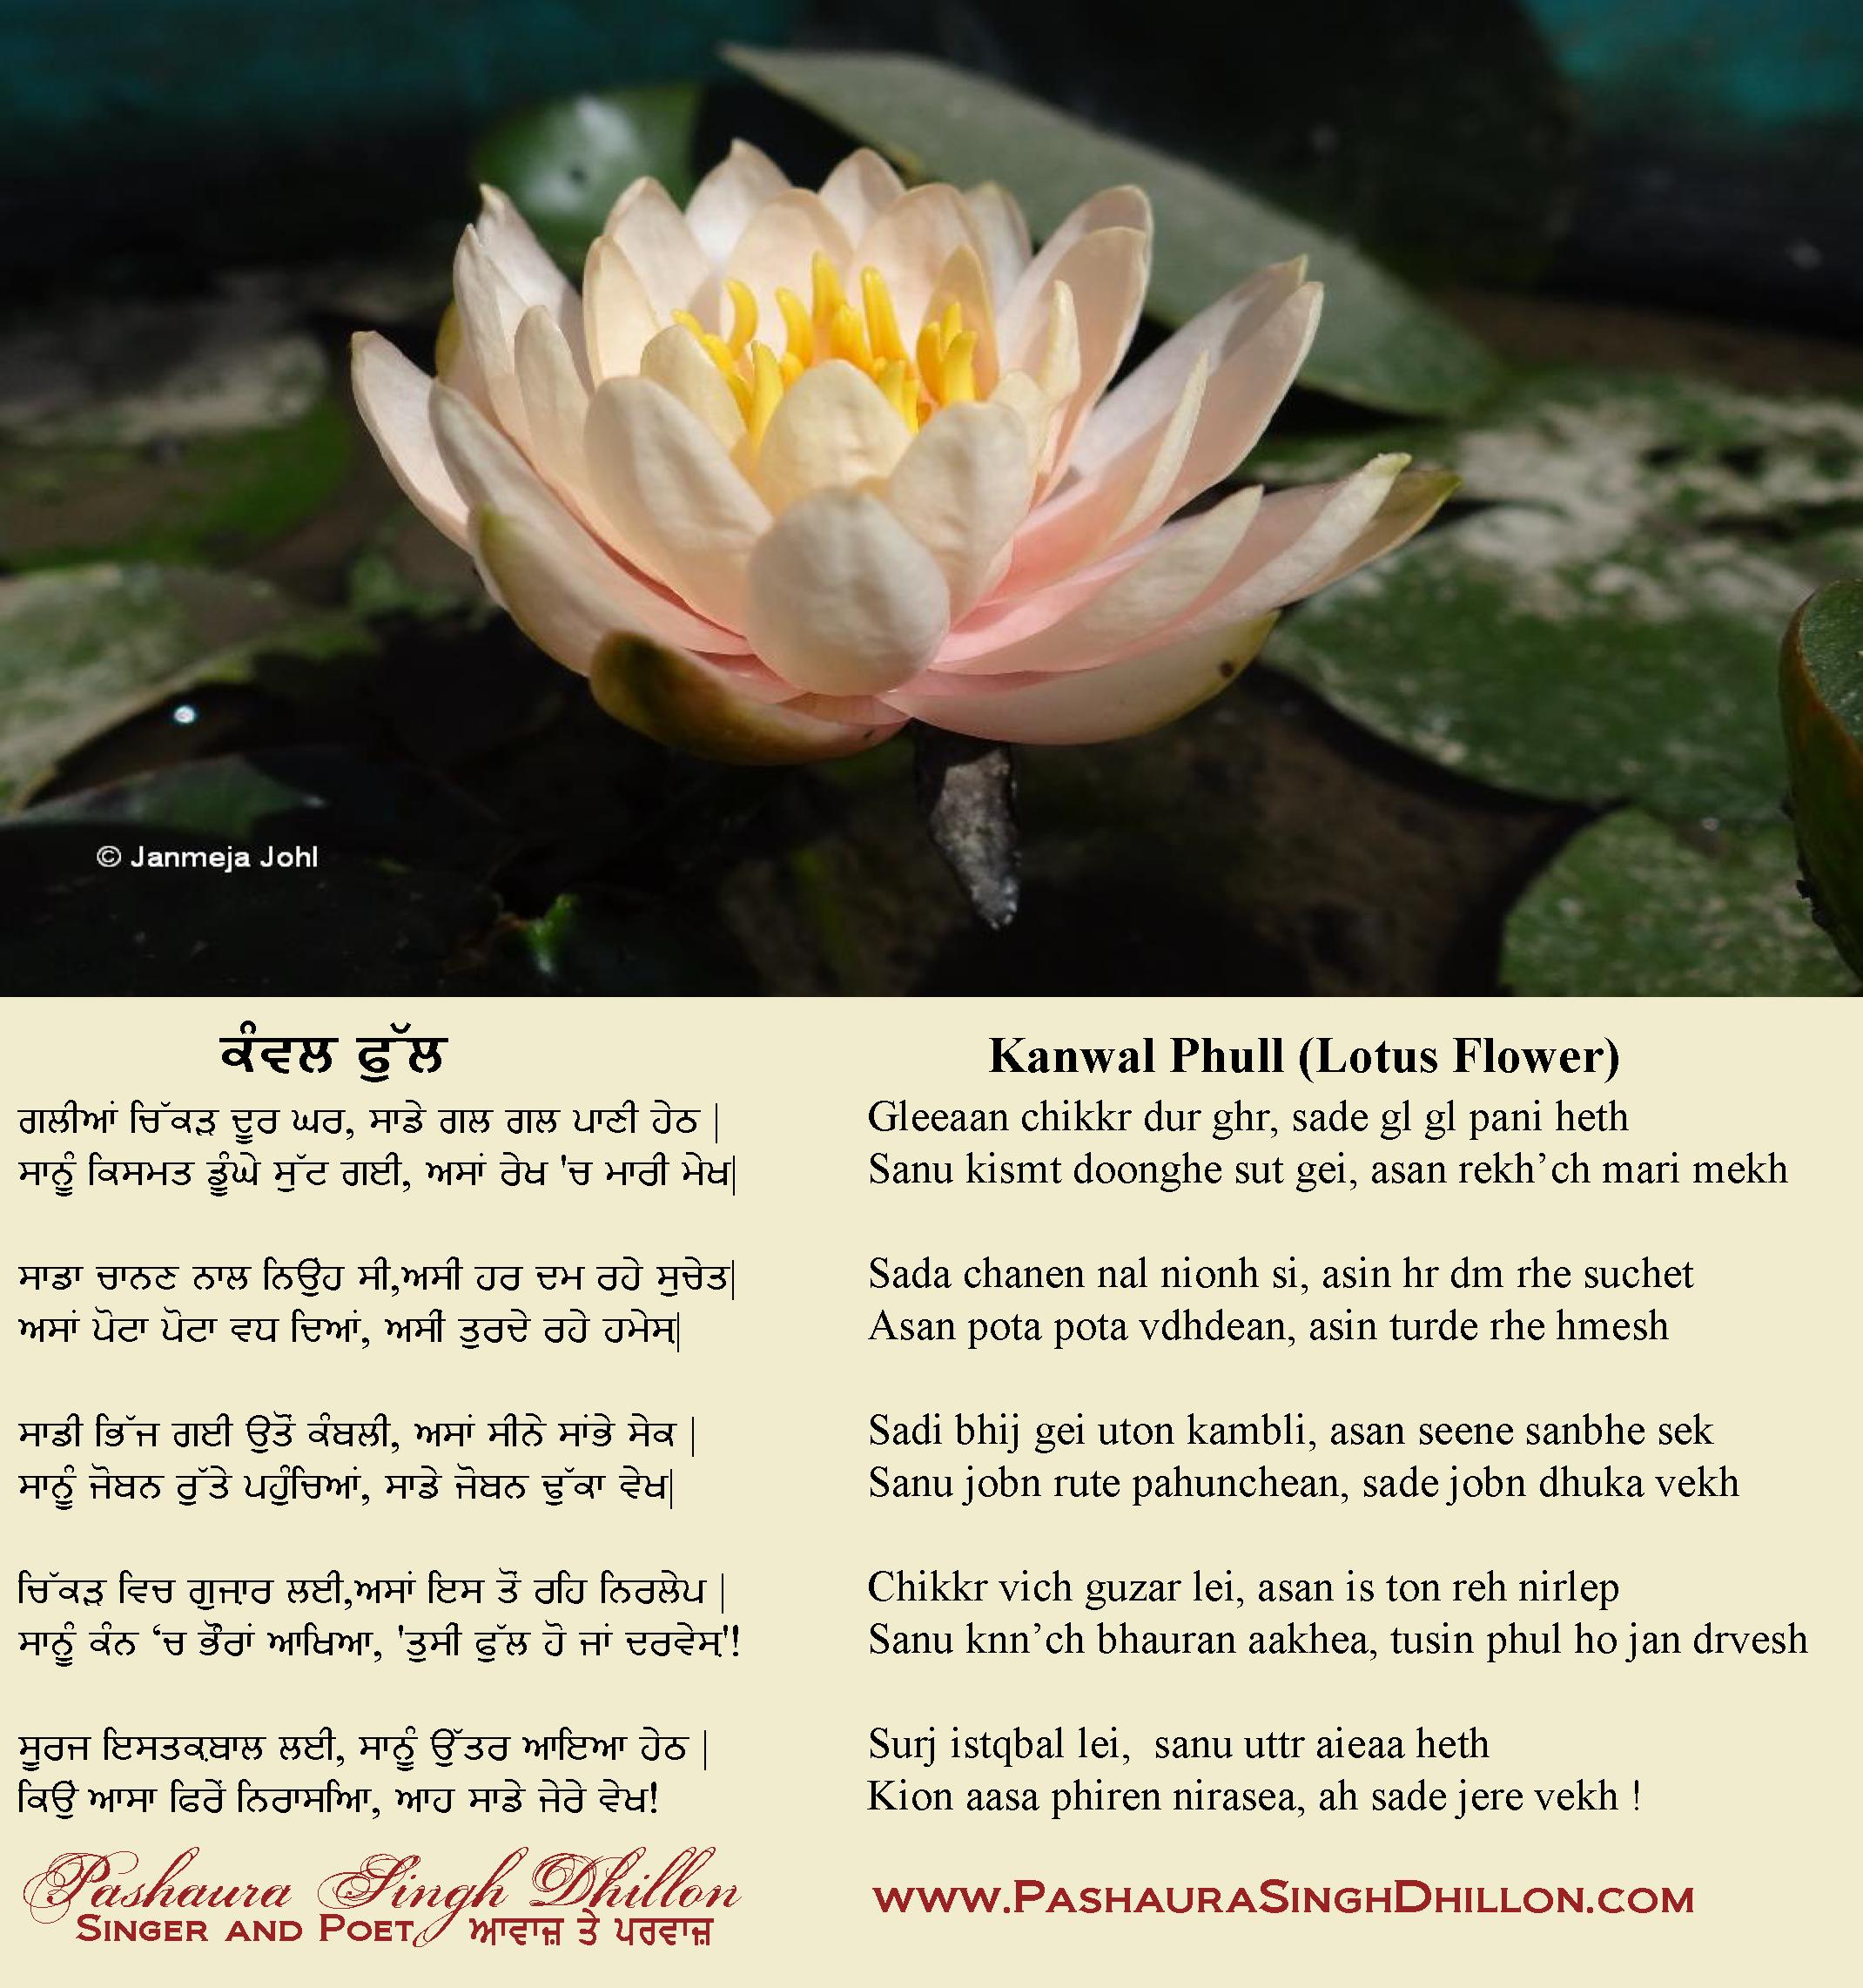 Lotus flower poems quotes gallery flower decoration ideas lotus flower poems quotes flowers gallery lotus flower poems quotes hd image mightylinksfo izmirmasajfo